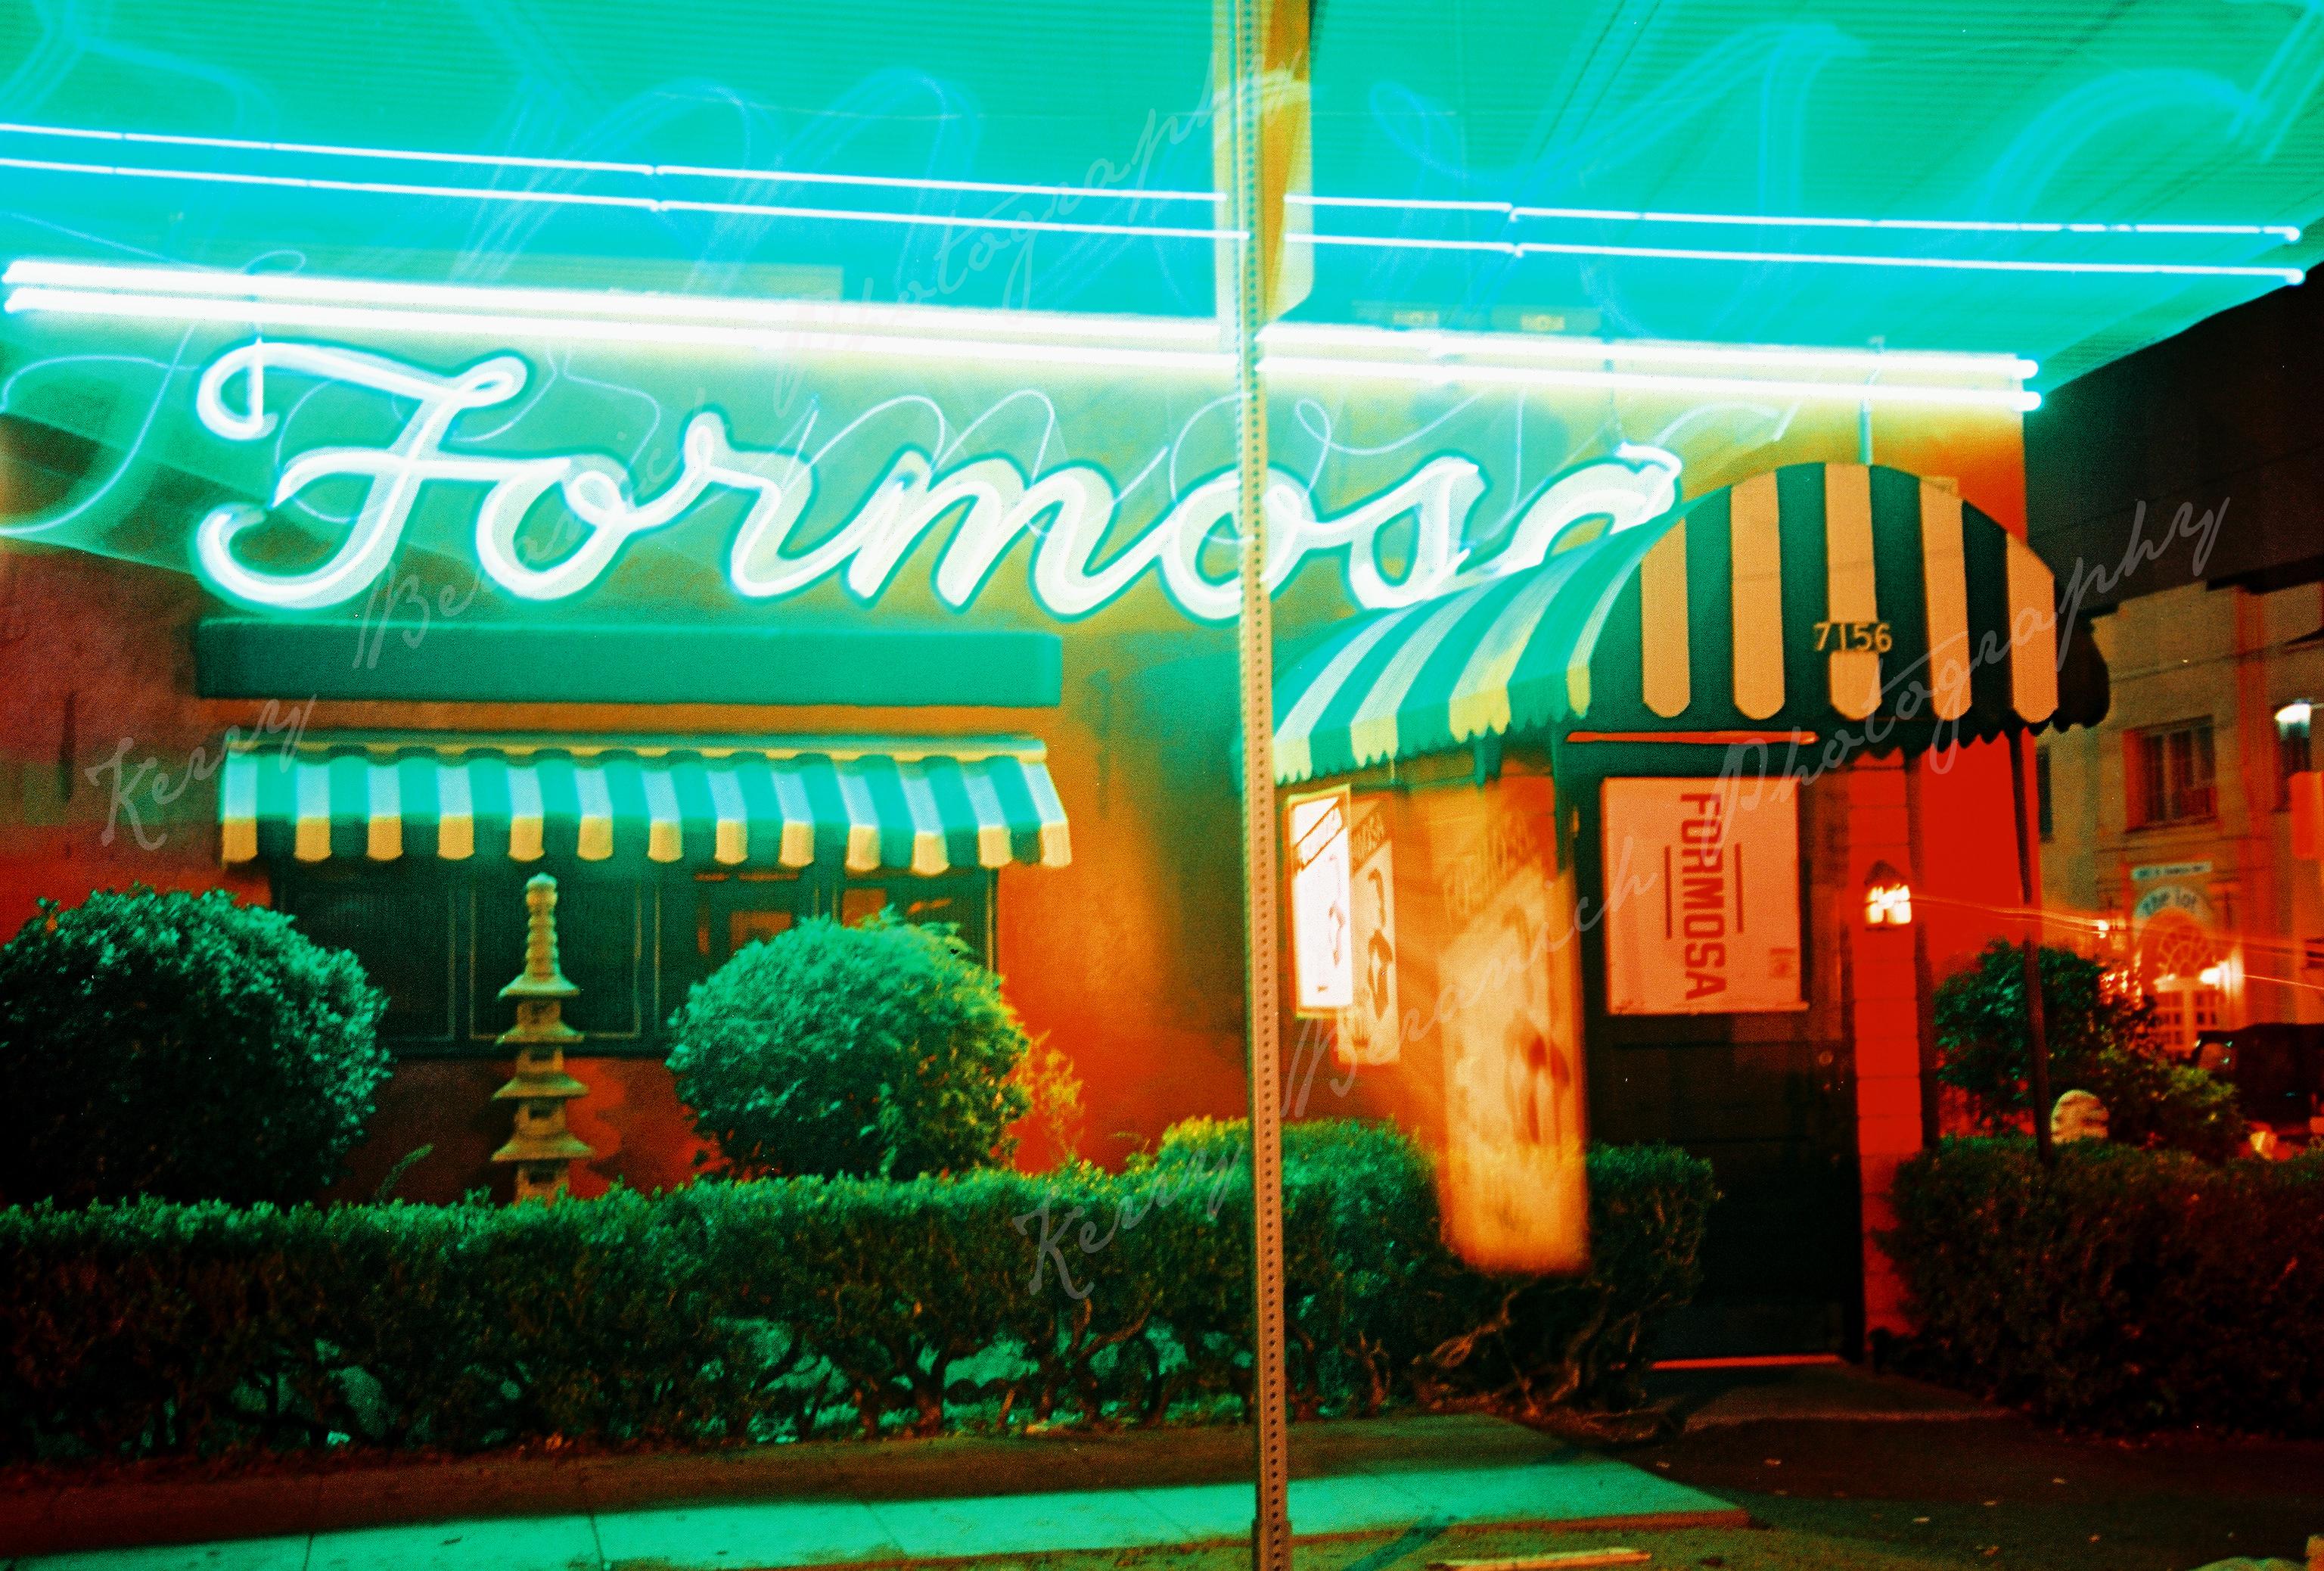 Formosa watermark